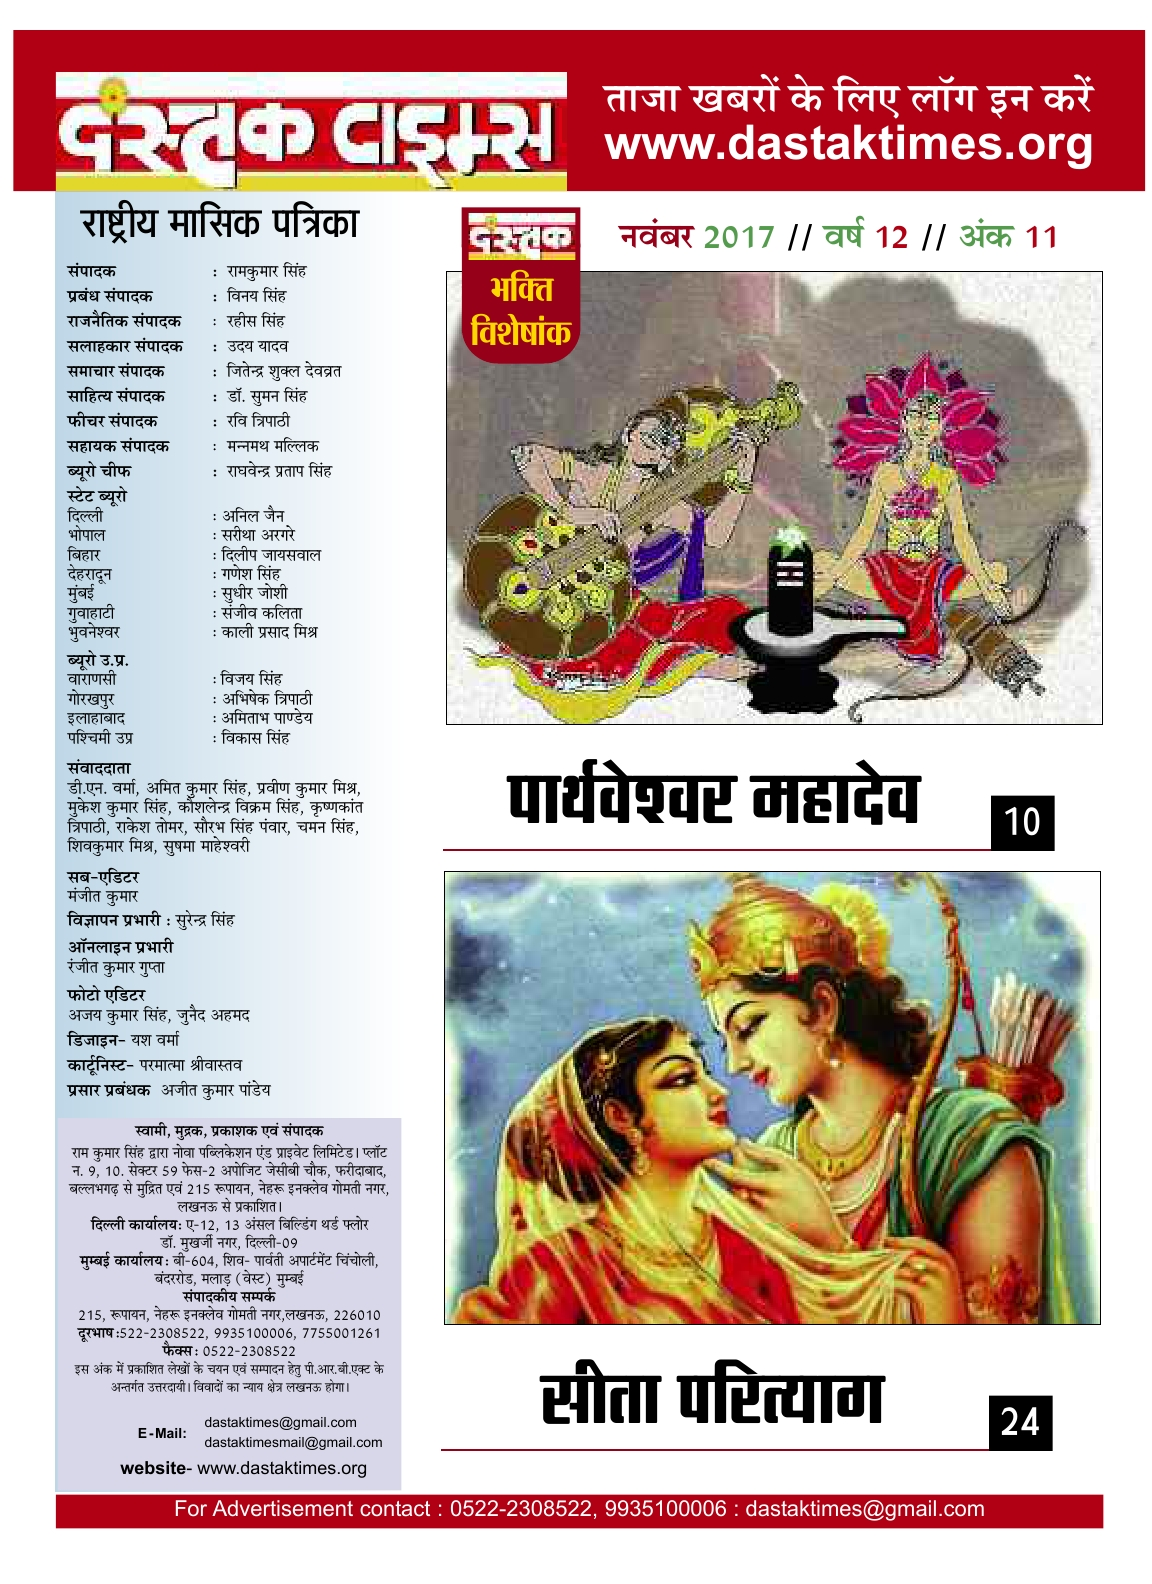 aasutosh rana magazine----mobile copy49